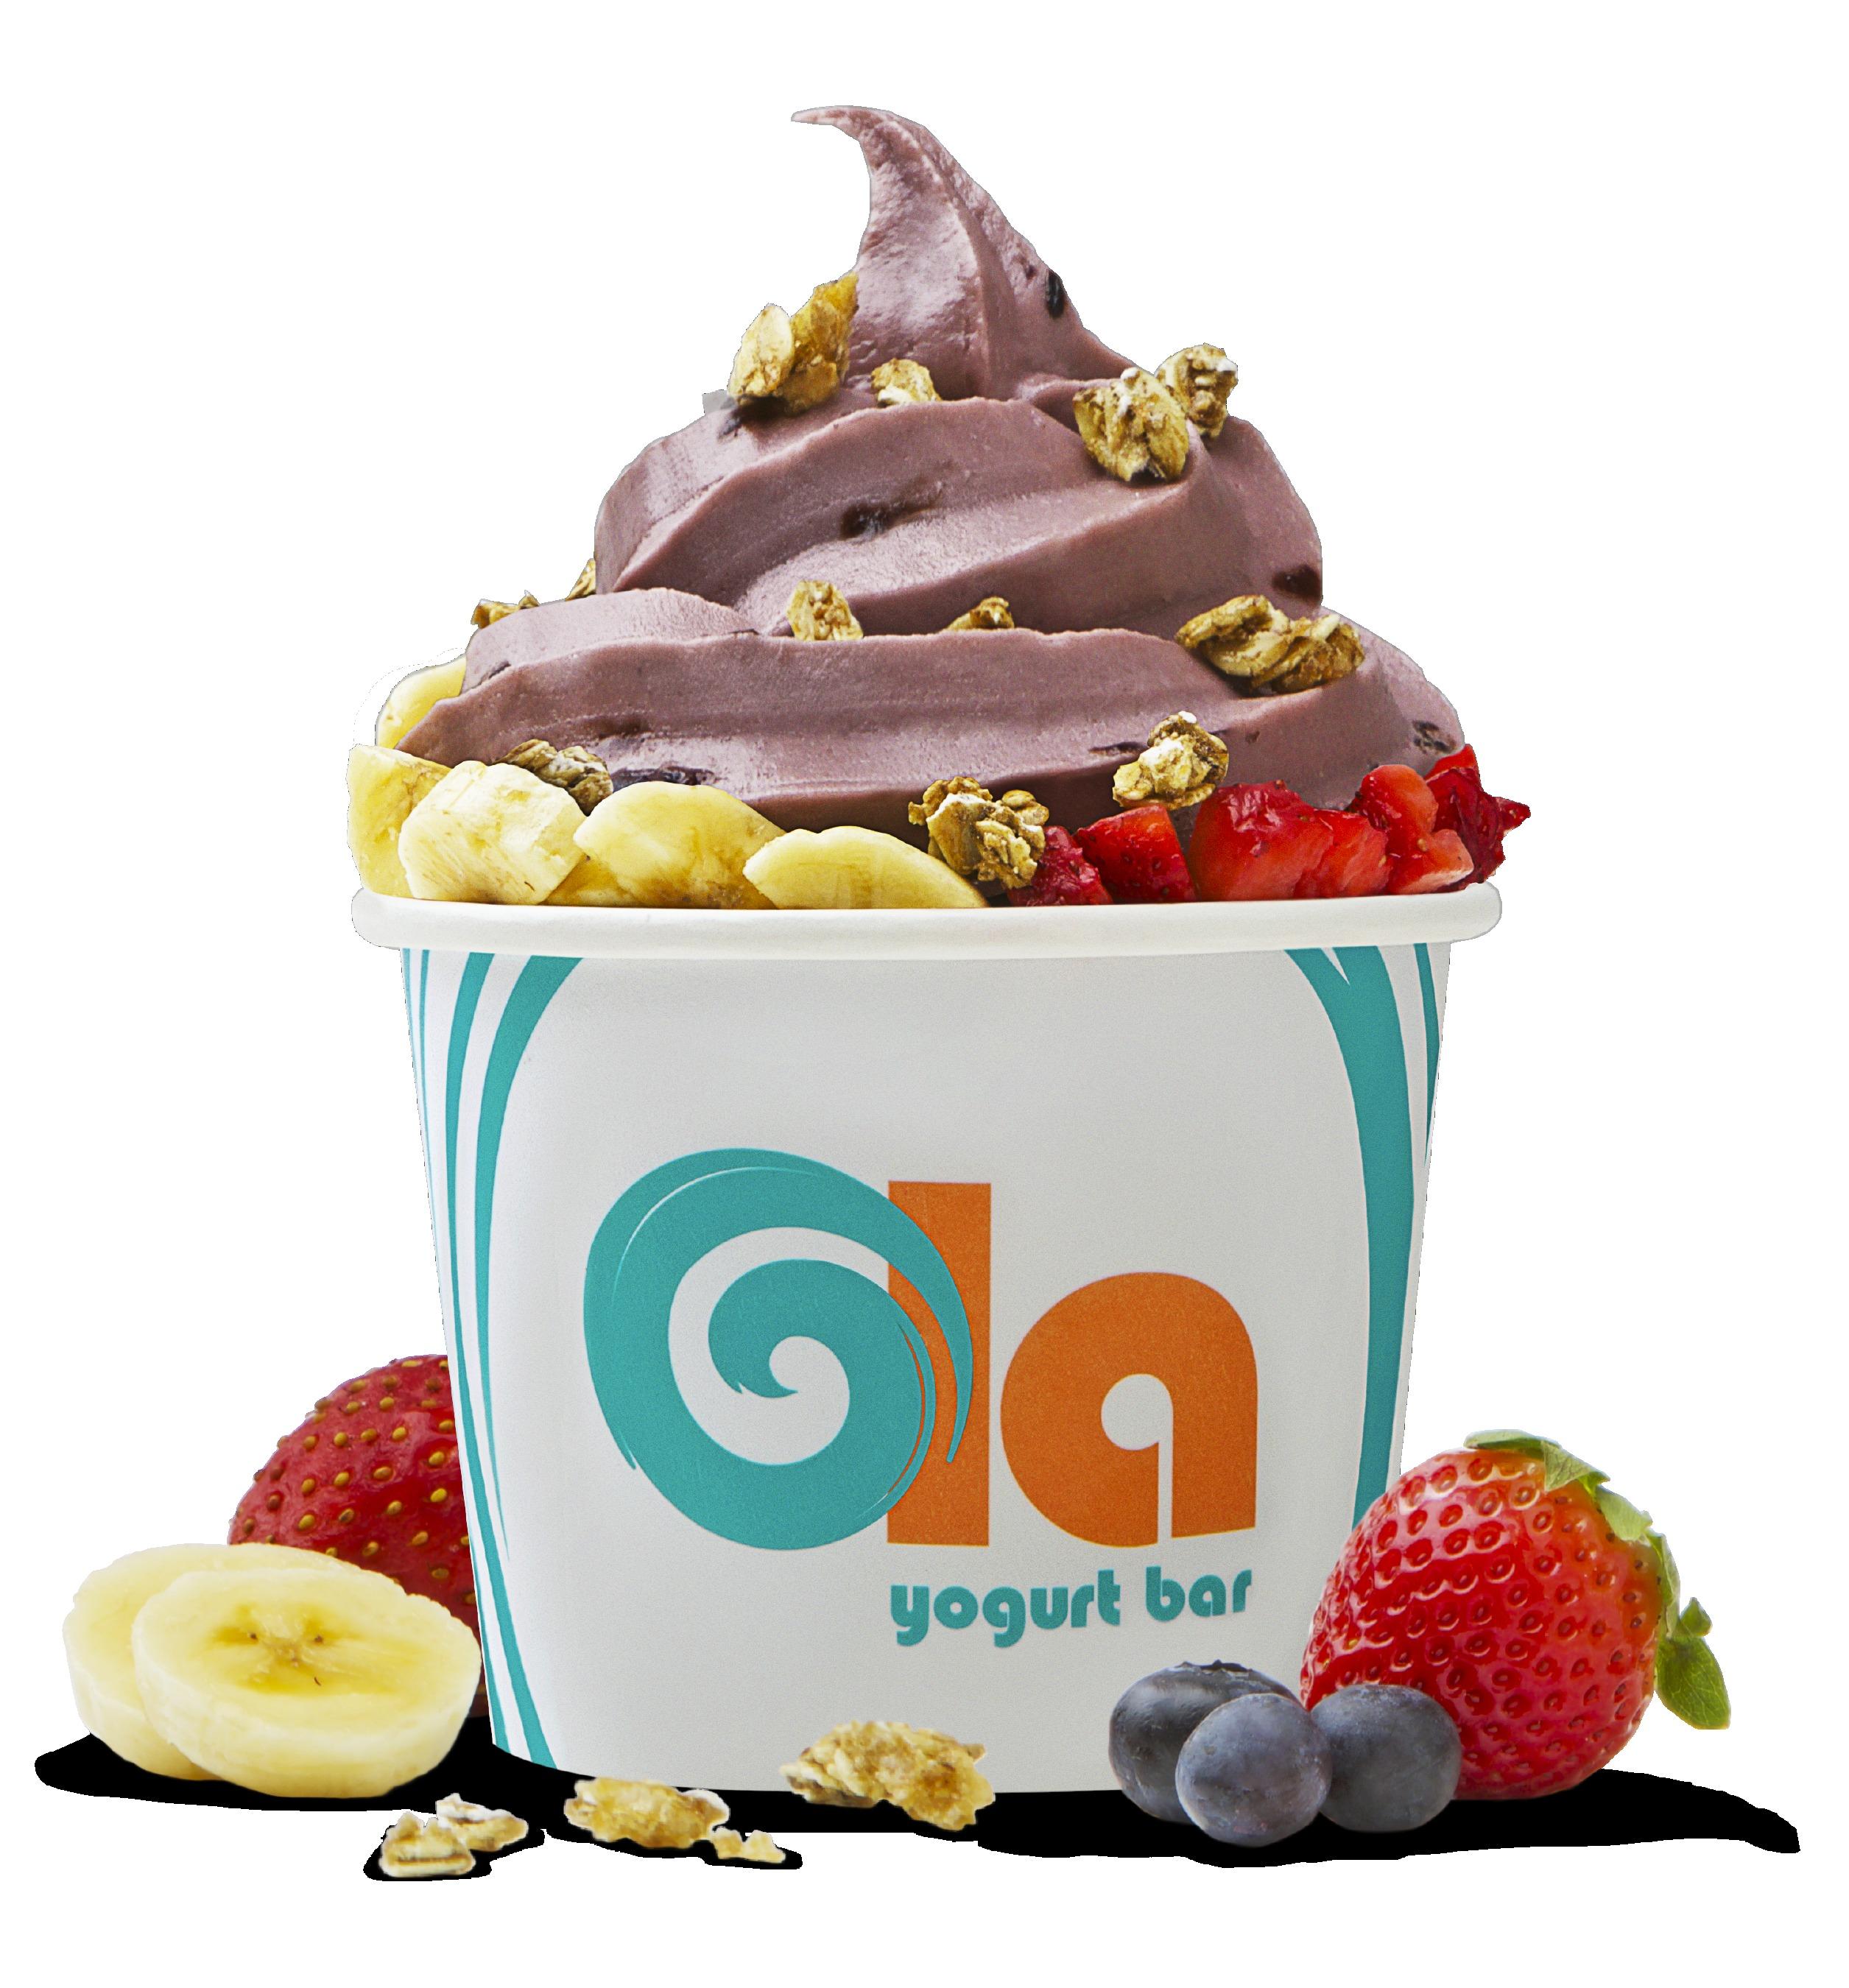 ola-yogurtproduct-shotspresentacionblendola-acai-g.jpg